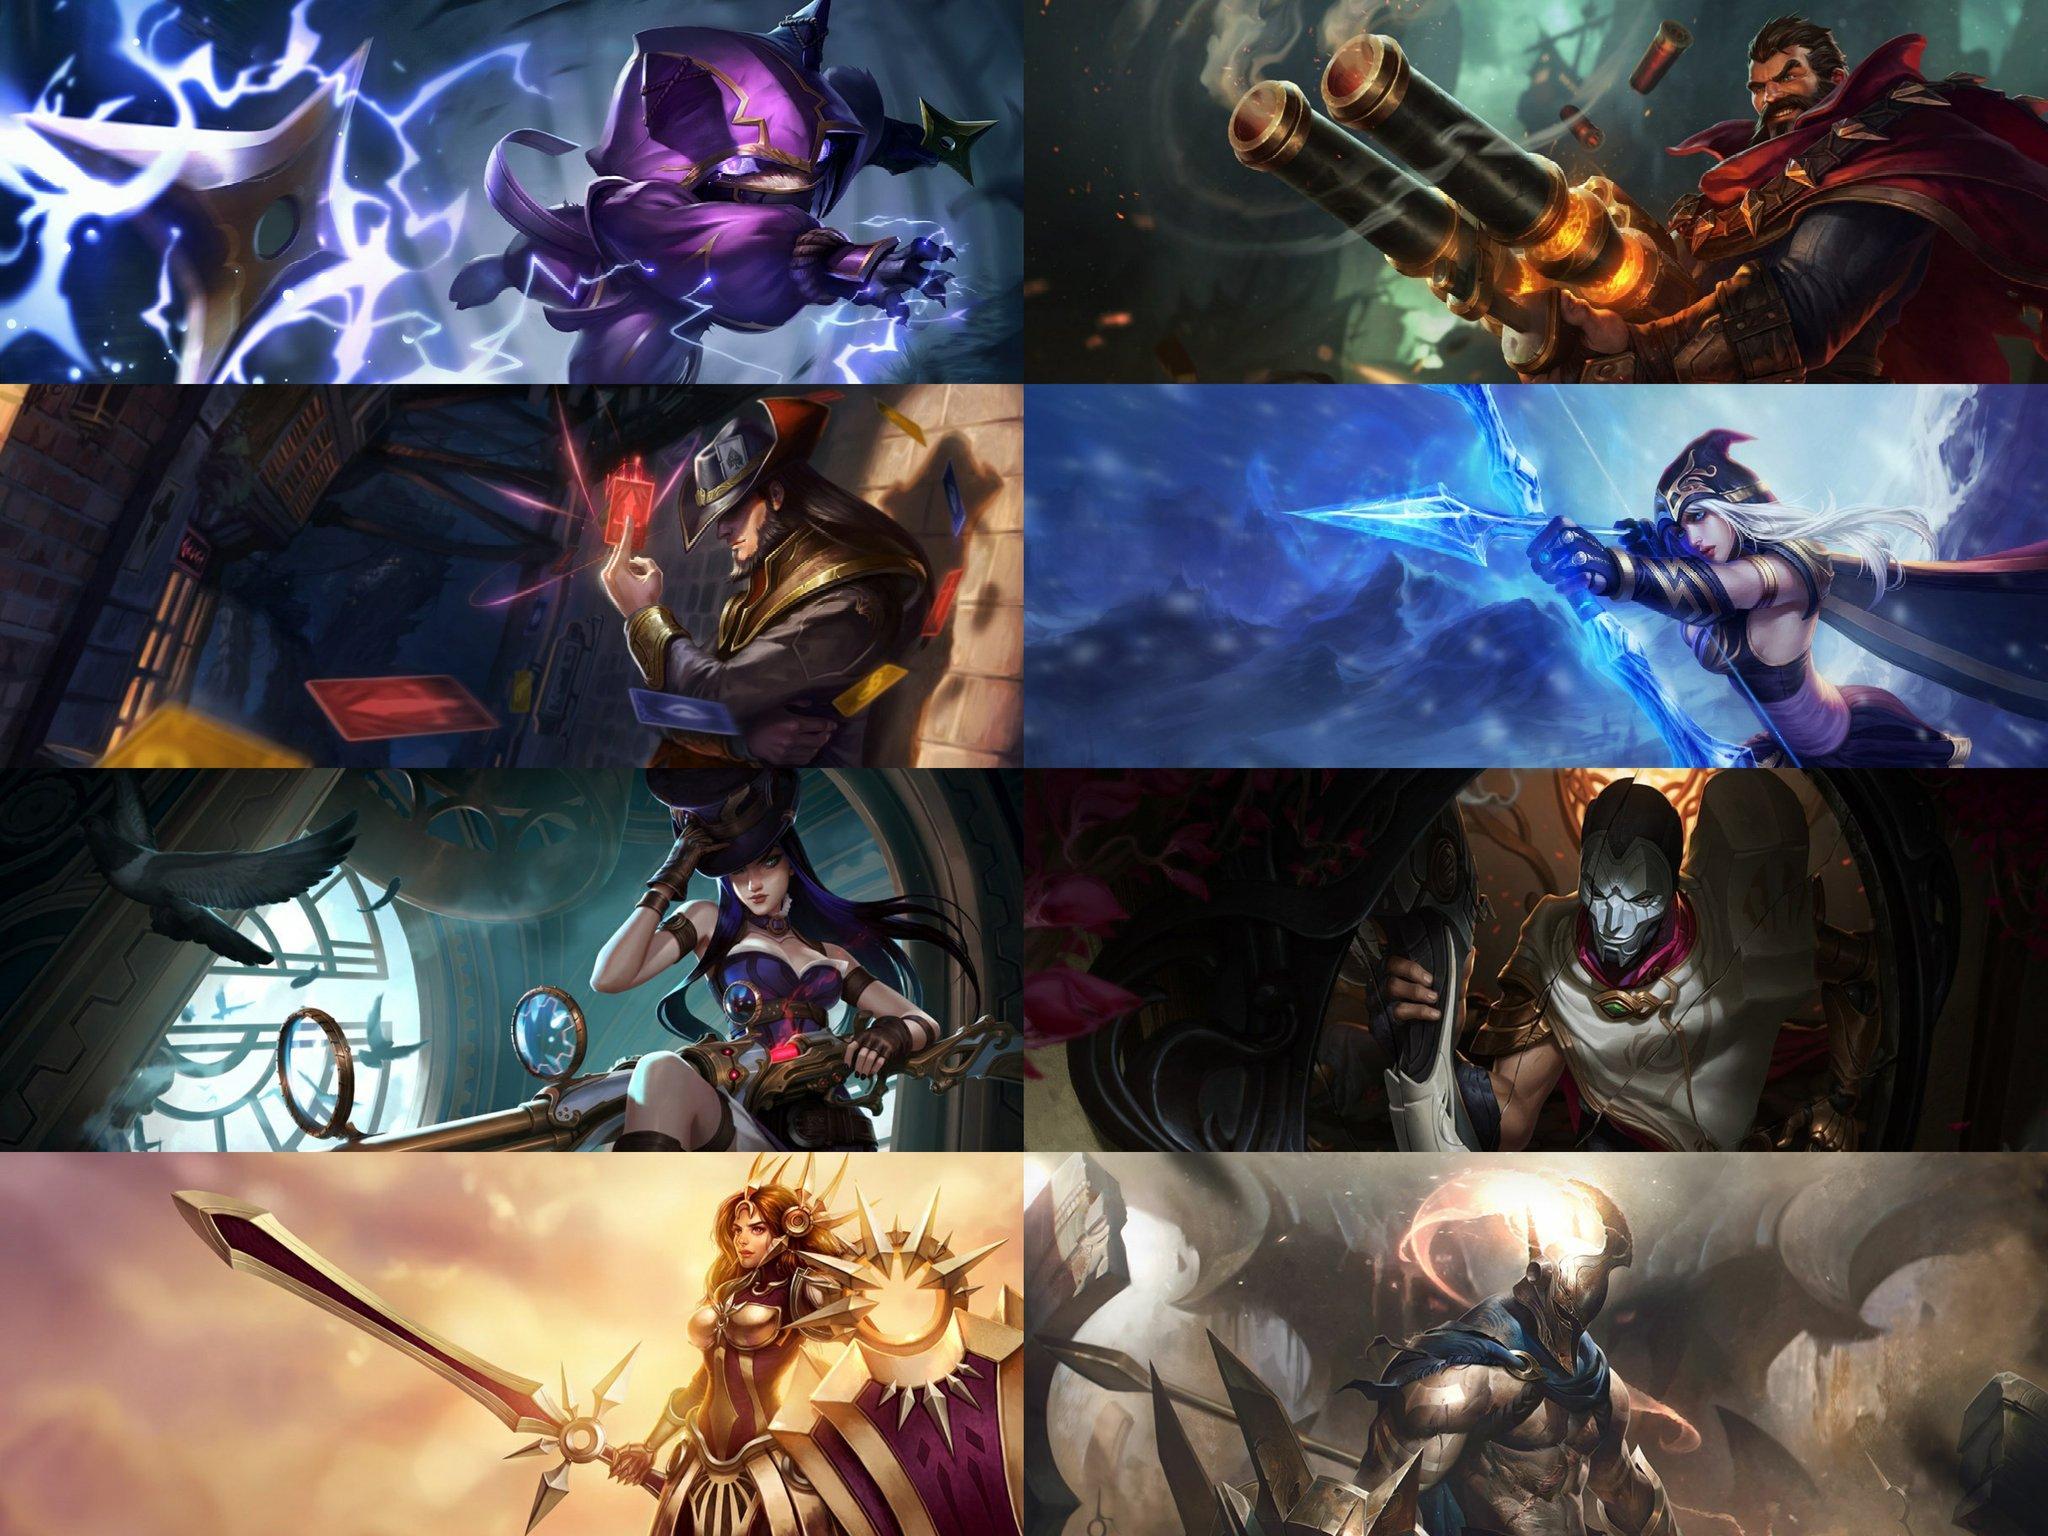 Imagem: Campeões de League of Legends